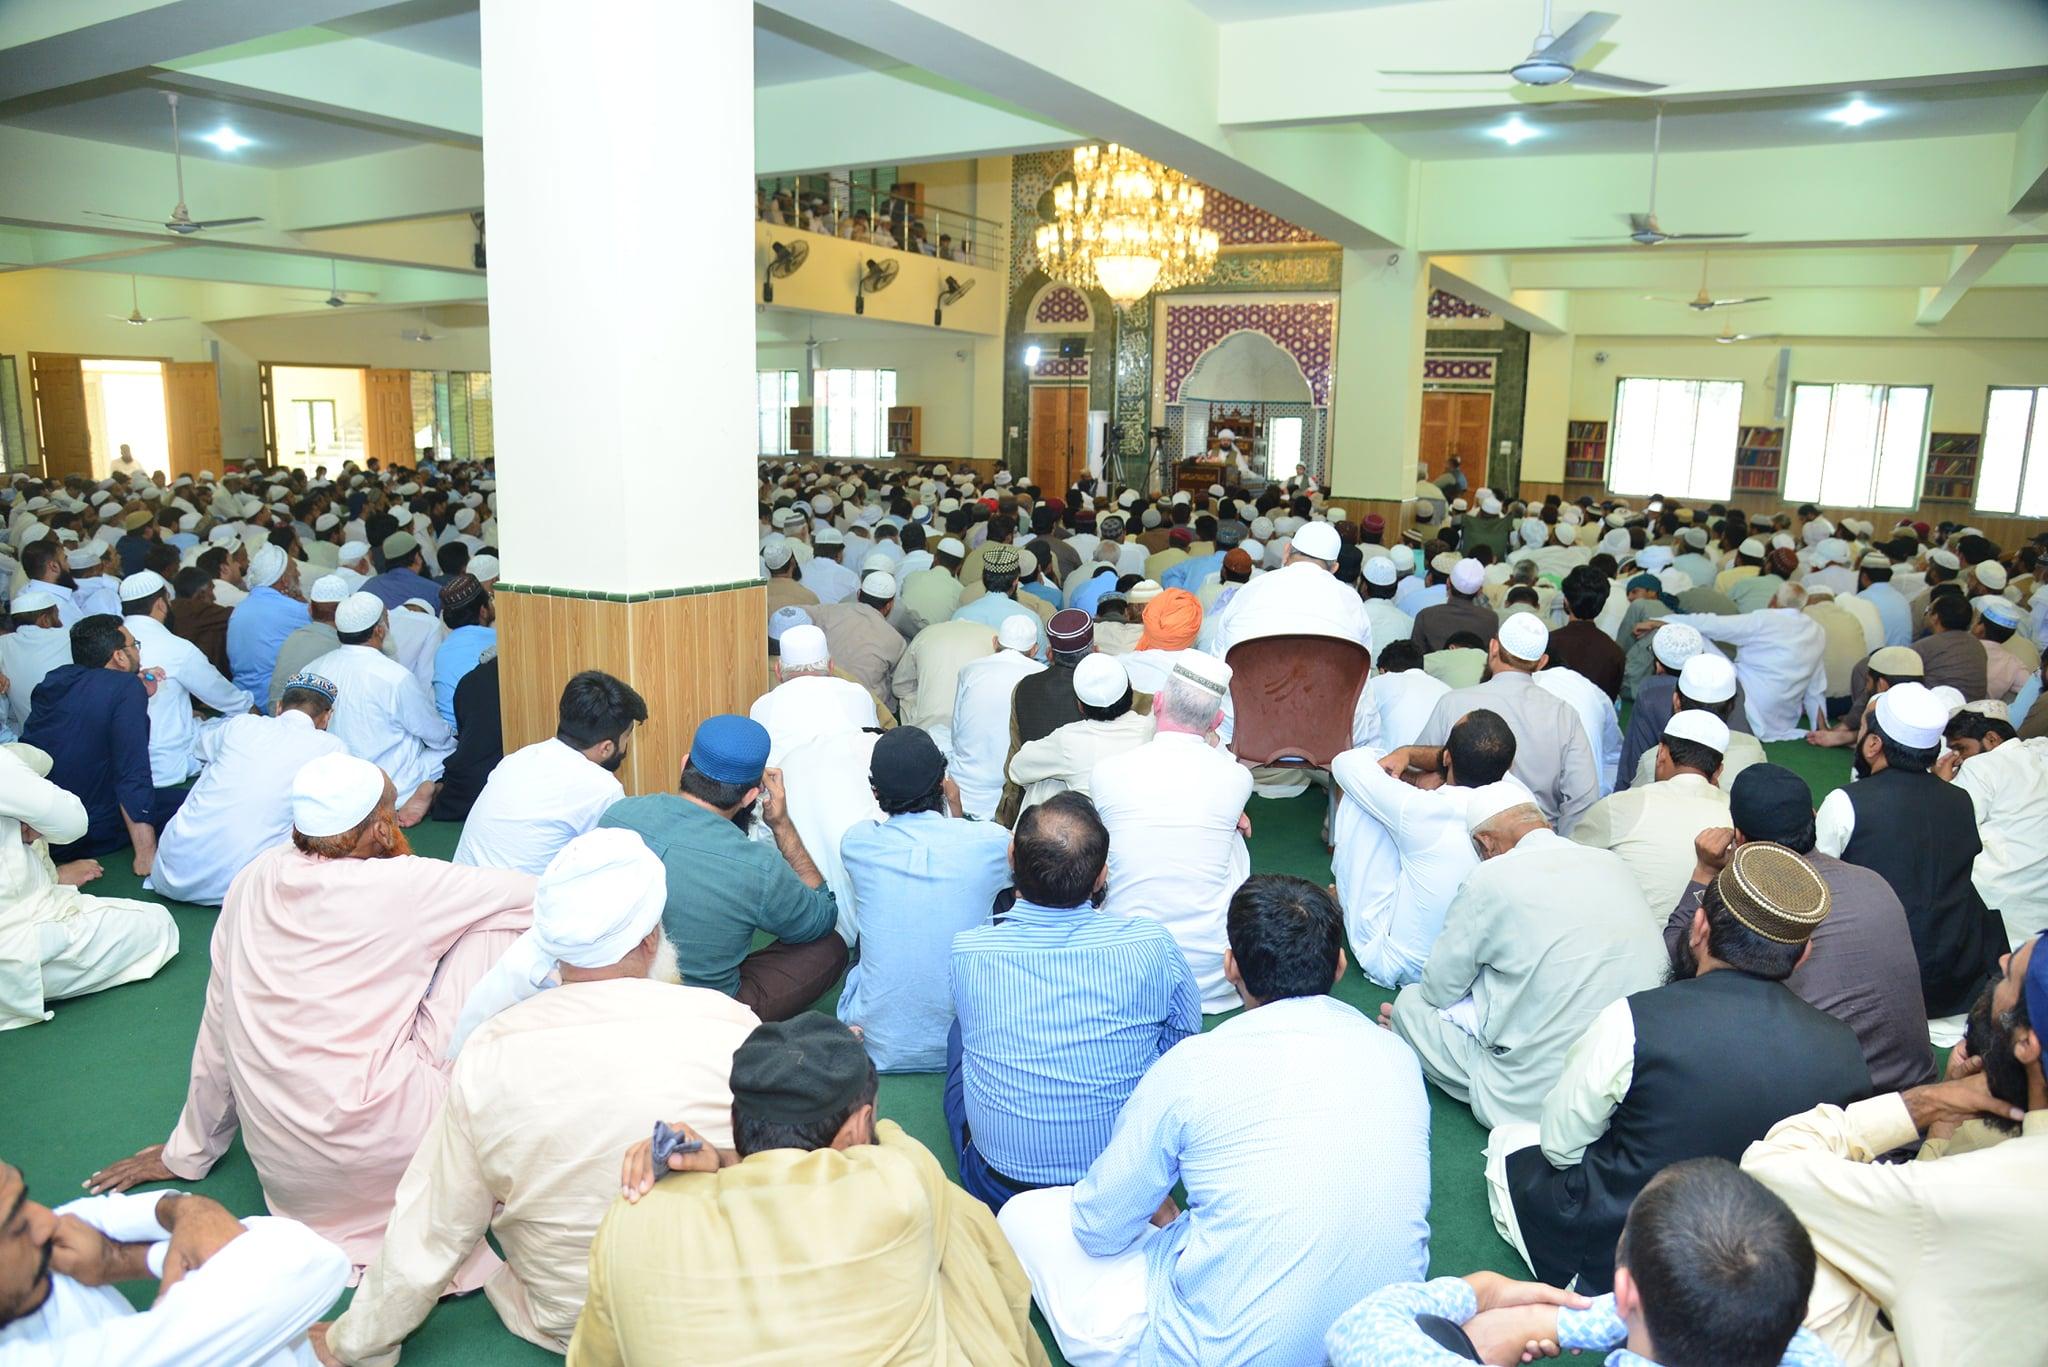 Jalsa Baisat Rehmat-e-Alam SAW, Dar ul Irfan Munara - 4